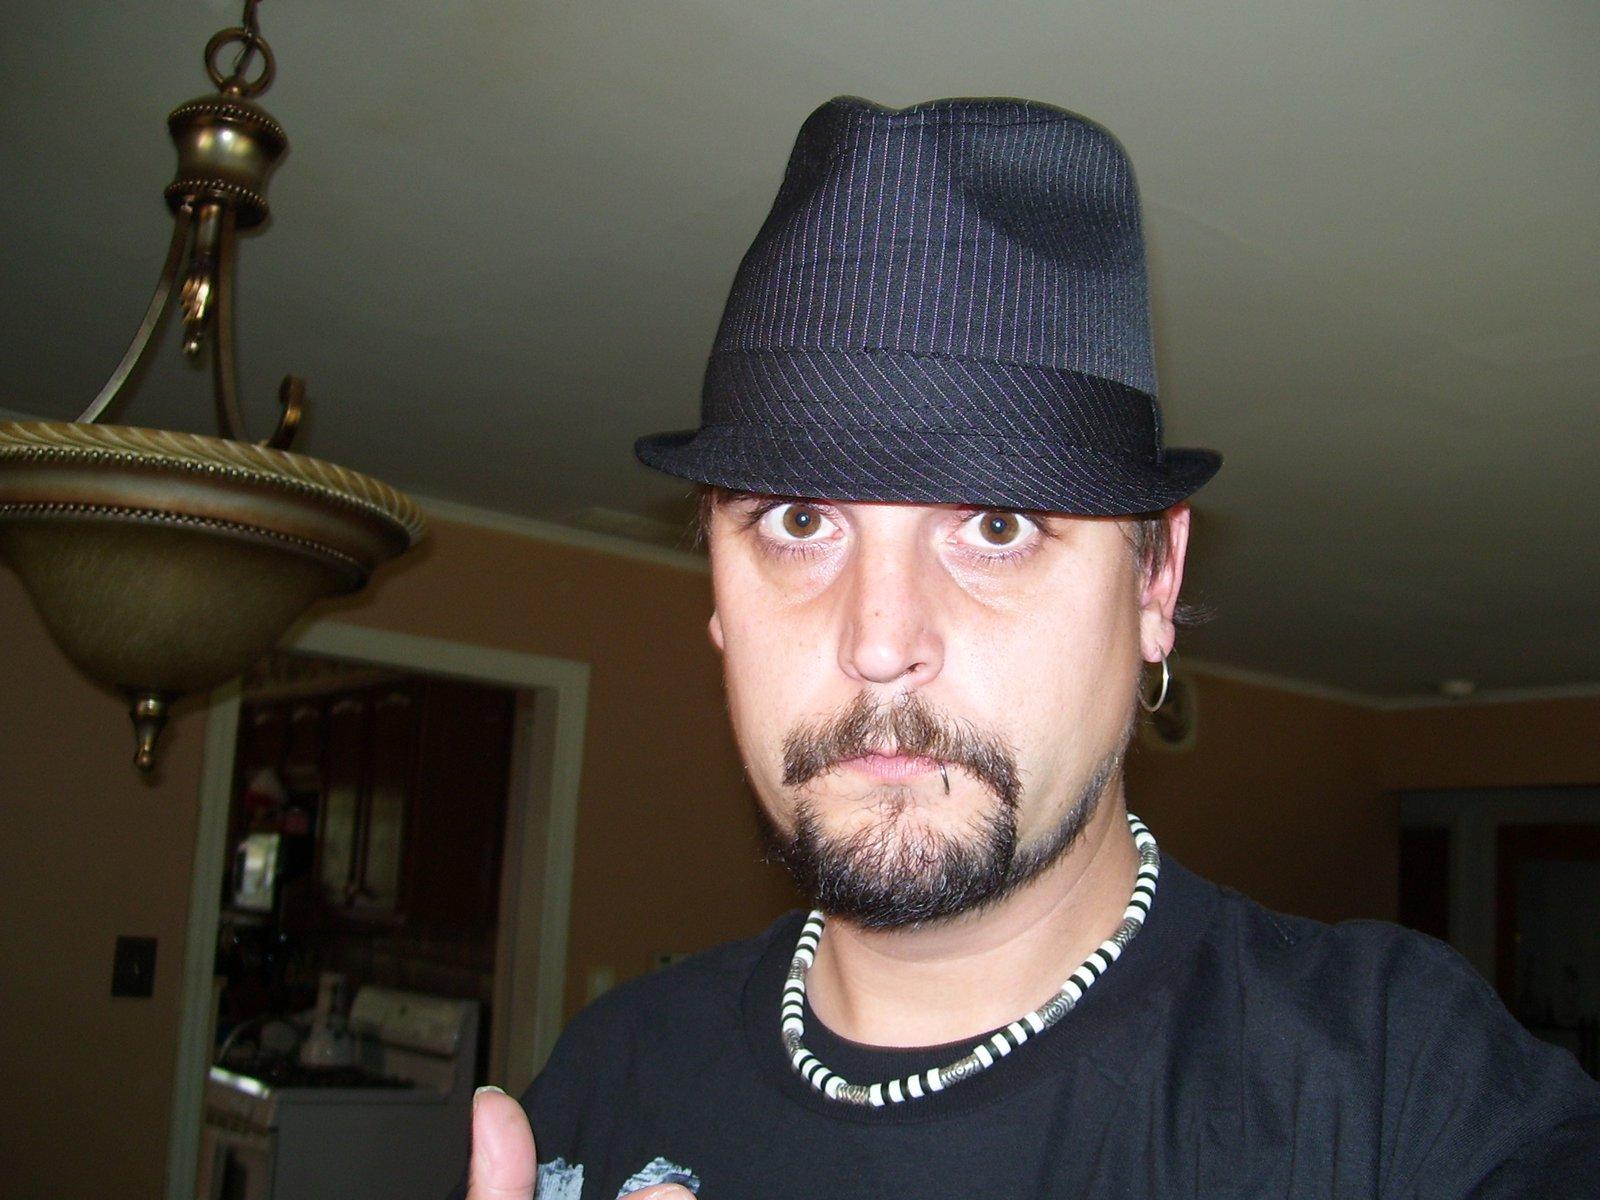 Pic of me